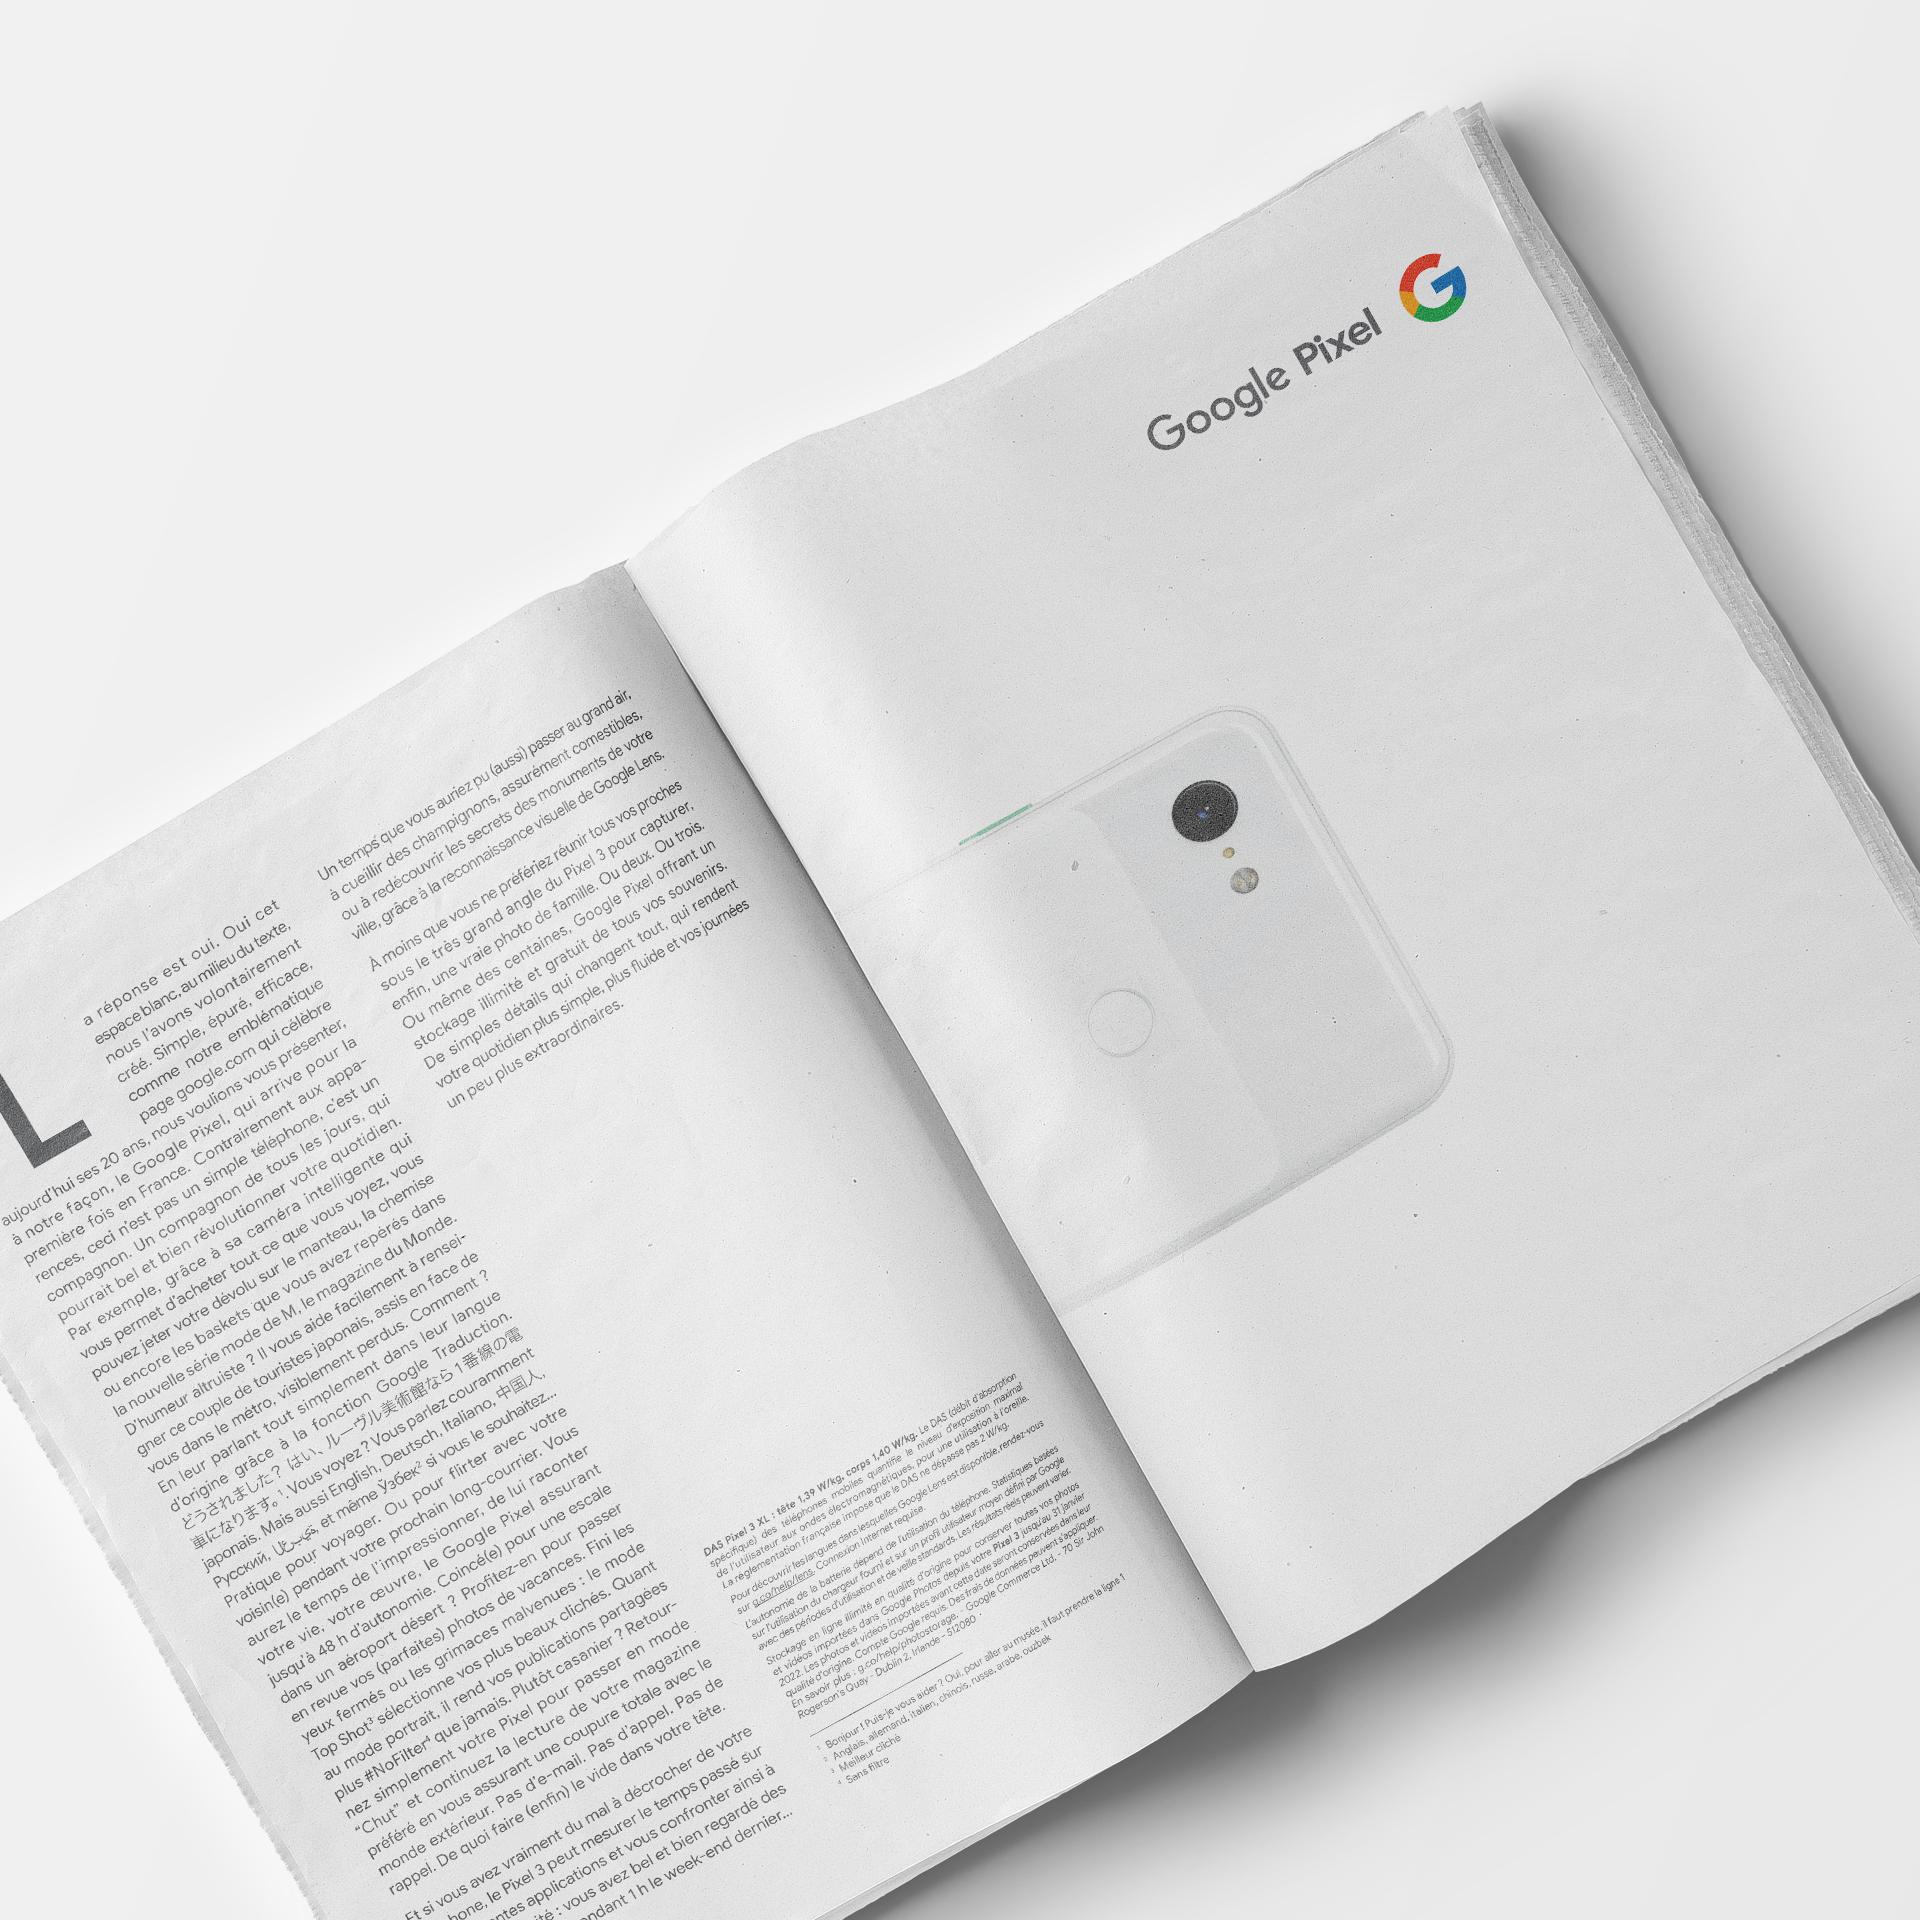 google_pixel_magazine.jpg